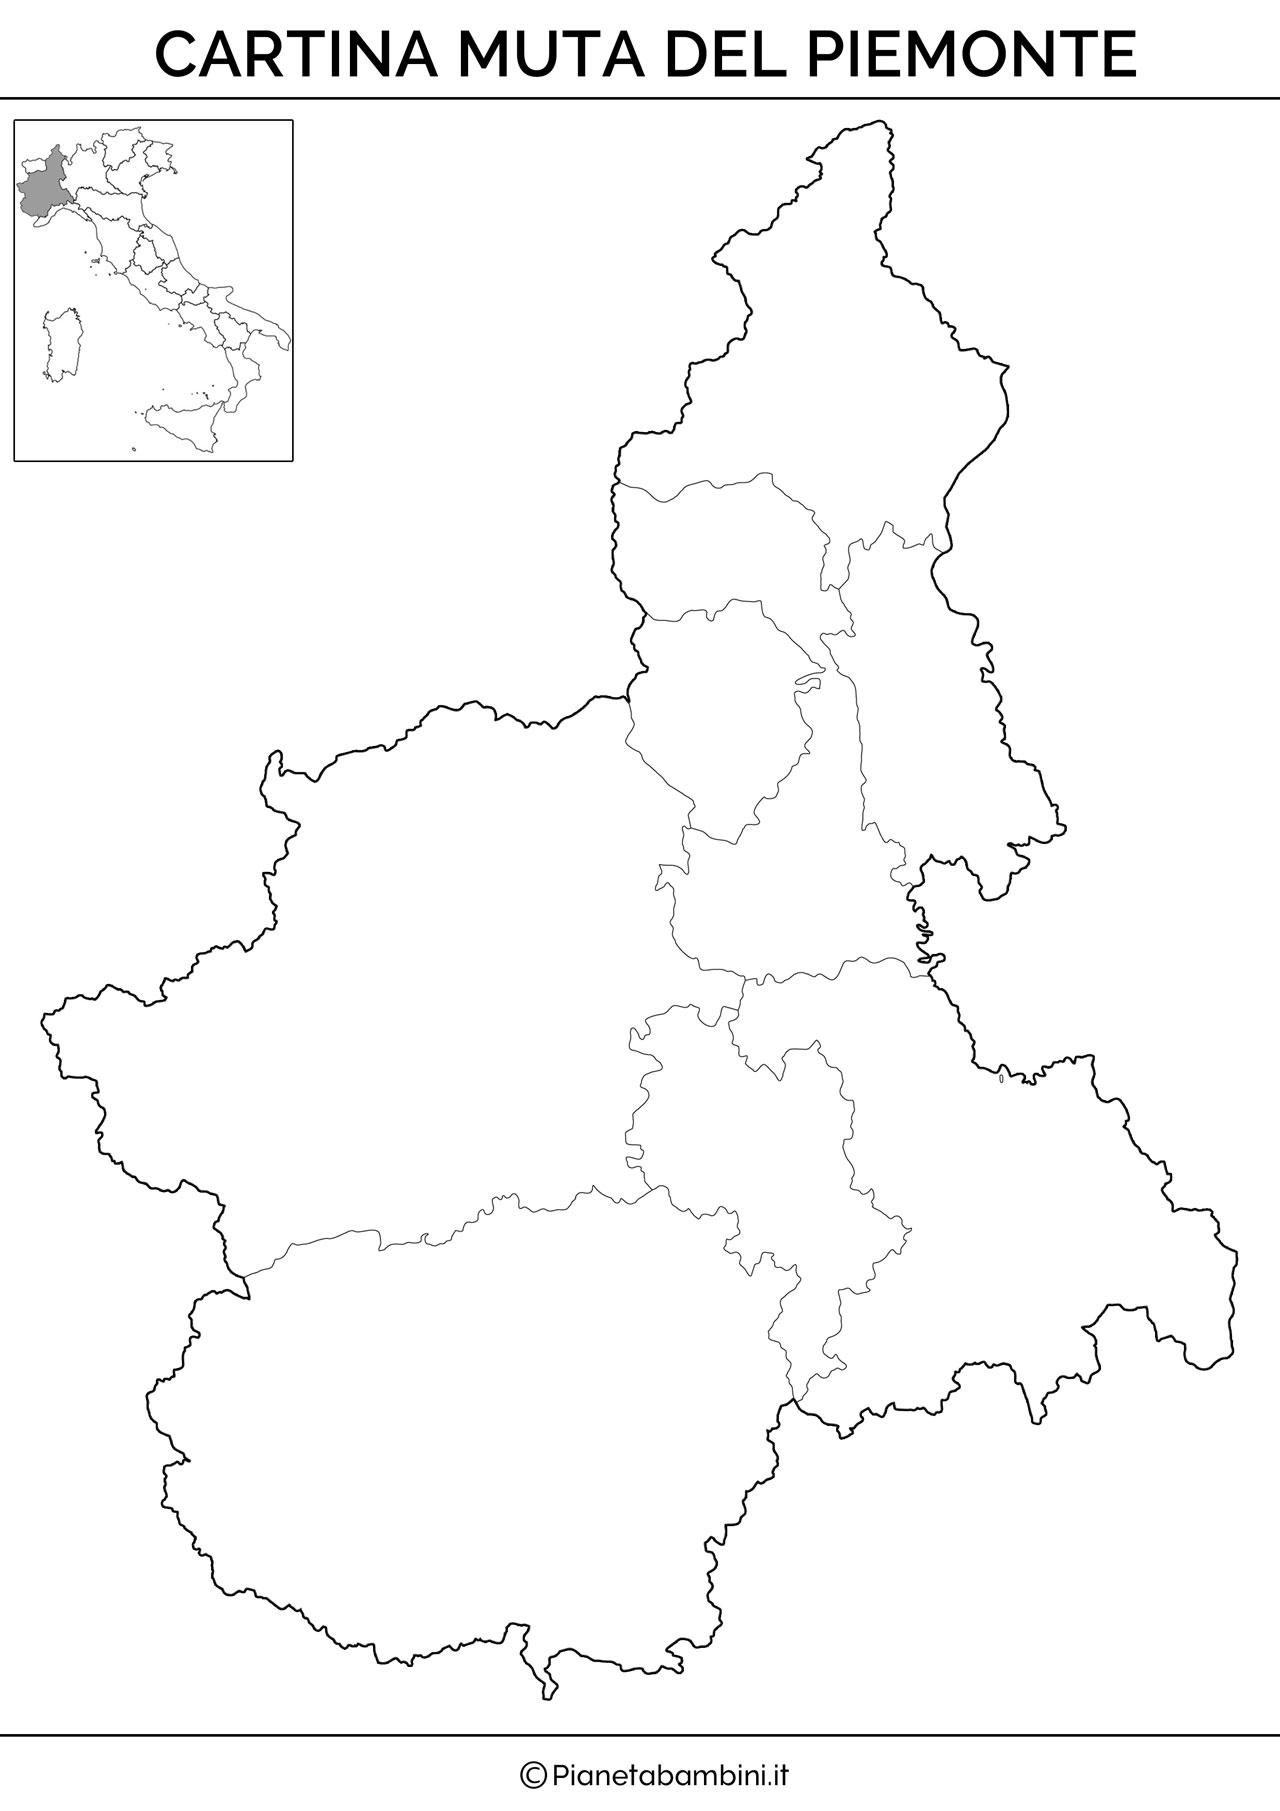 Cartina del Piemonte muta da stampare gratis